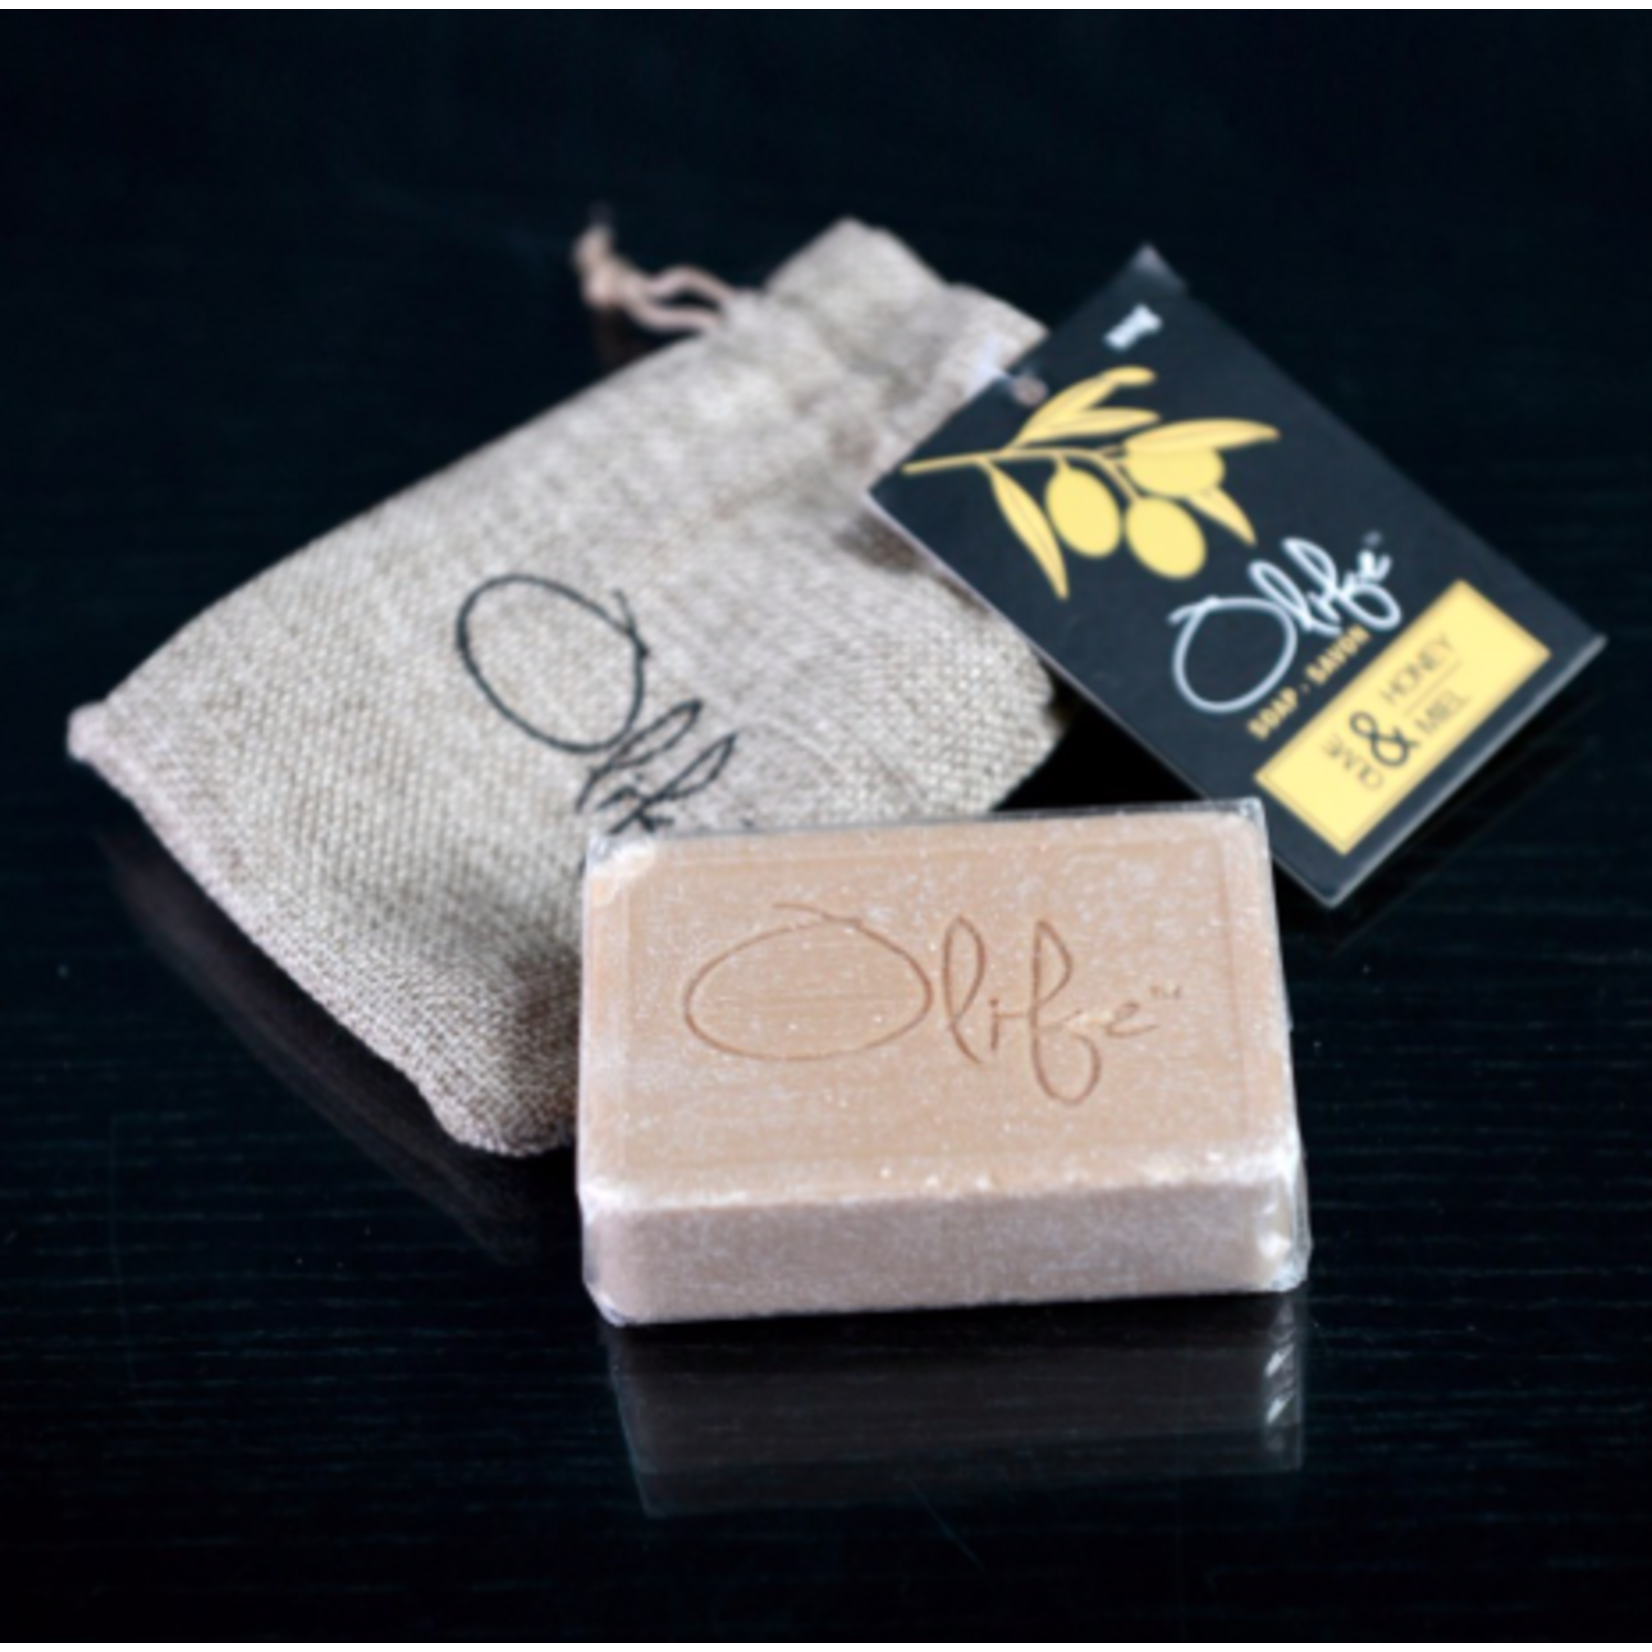 HANDMADE OLIVE SOAP - HONEY (Brown)